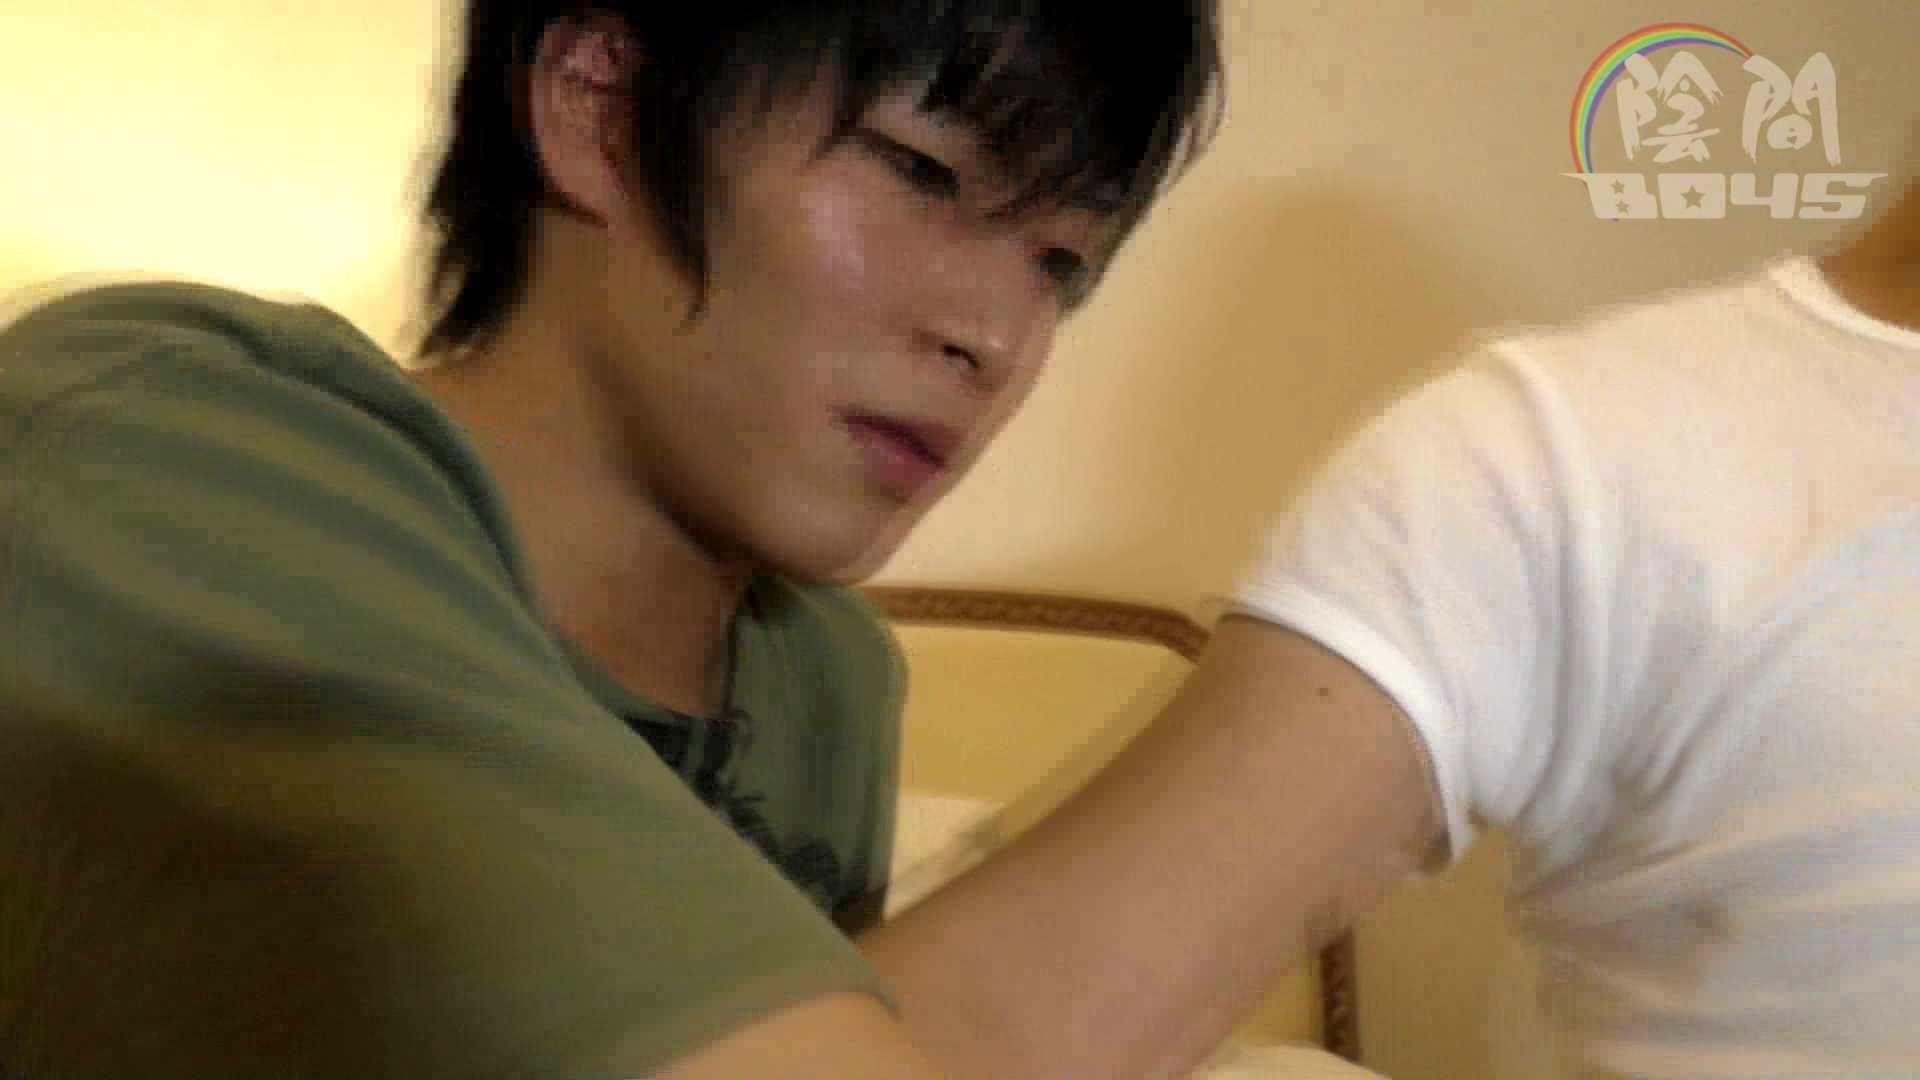 "ADの""ヒミツ""のお仕事 part1 No.02【期間限定】 HTDV ゲイエロ動画 77pic 54"